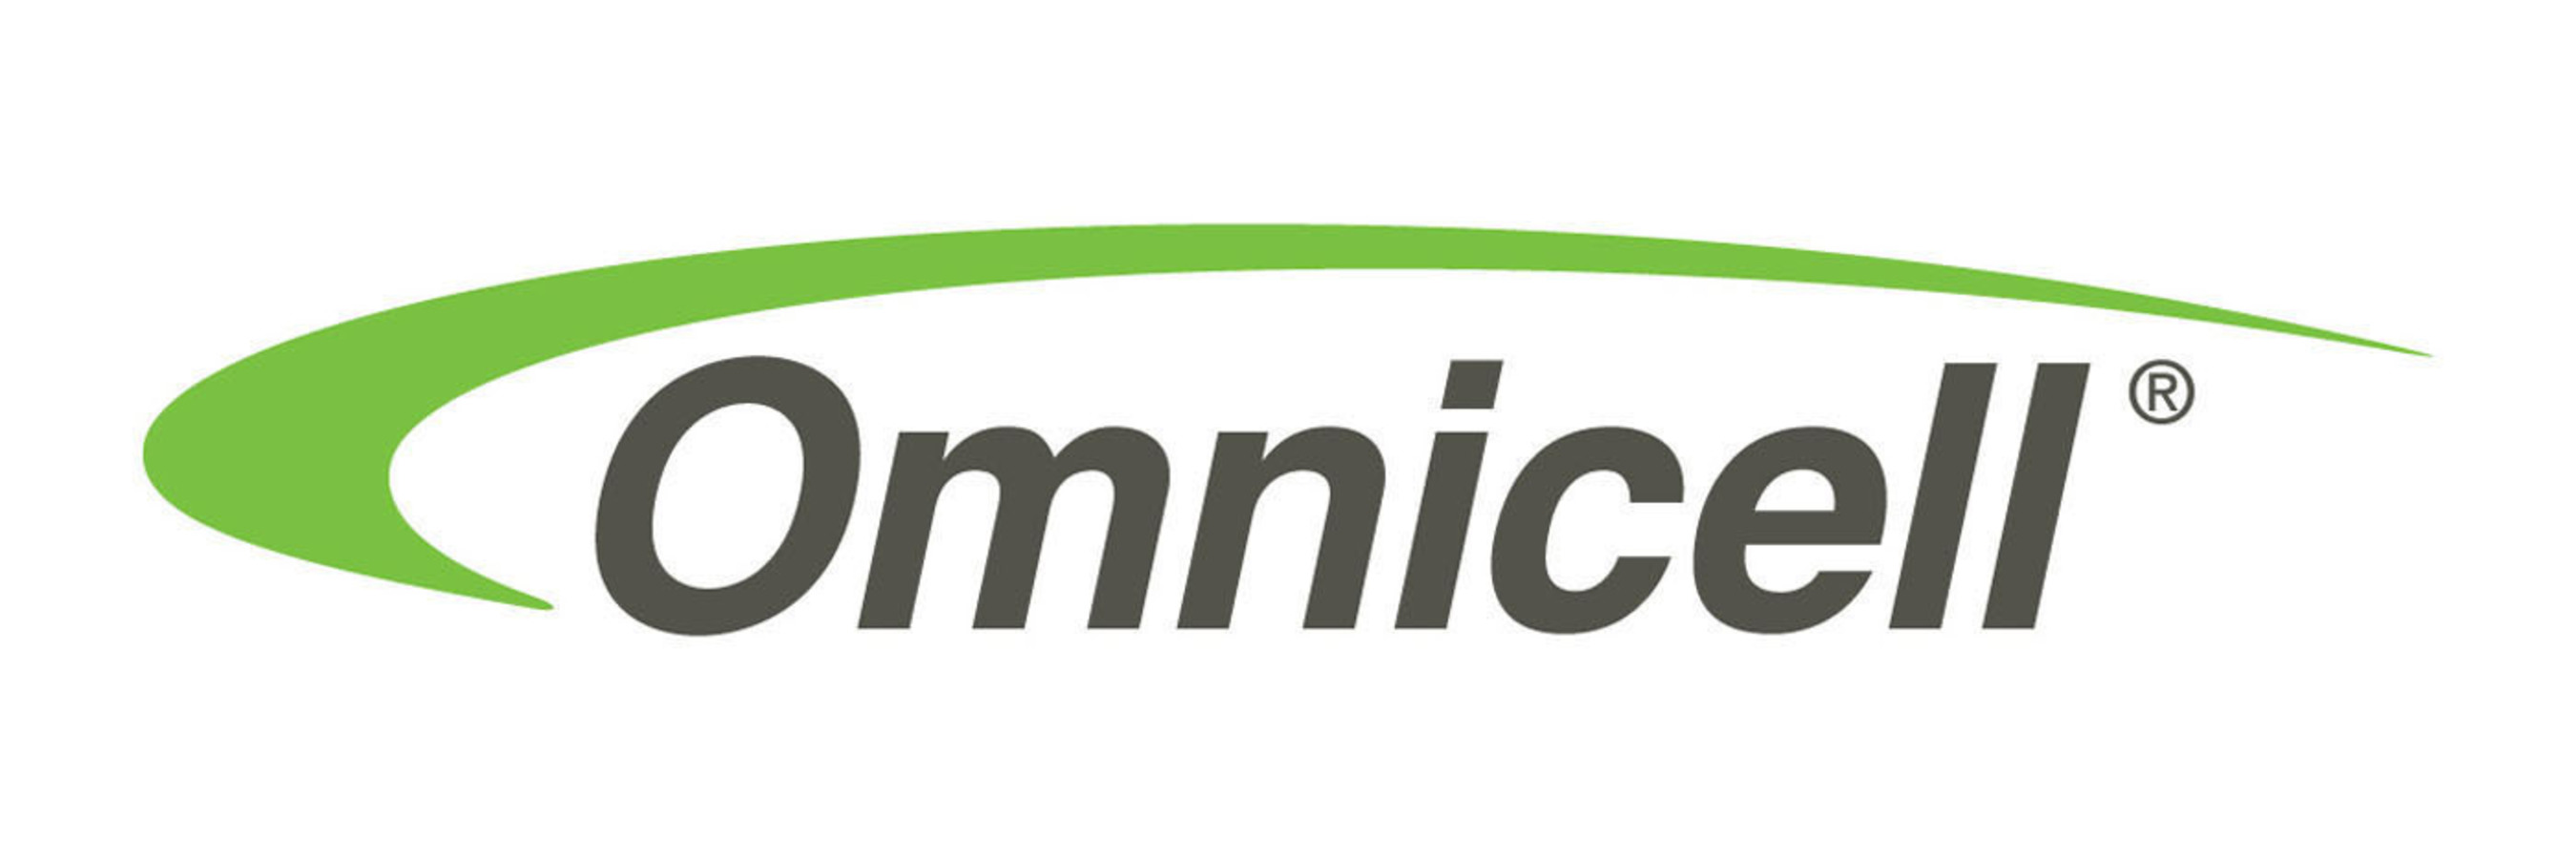 Omnicell, Inc. logo